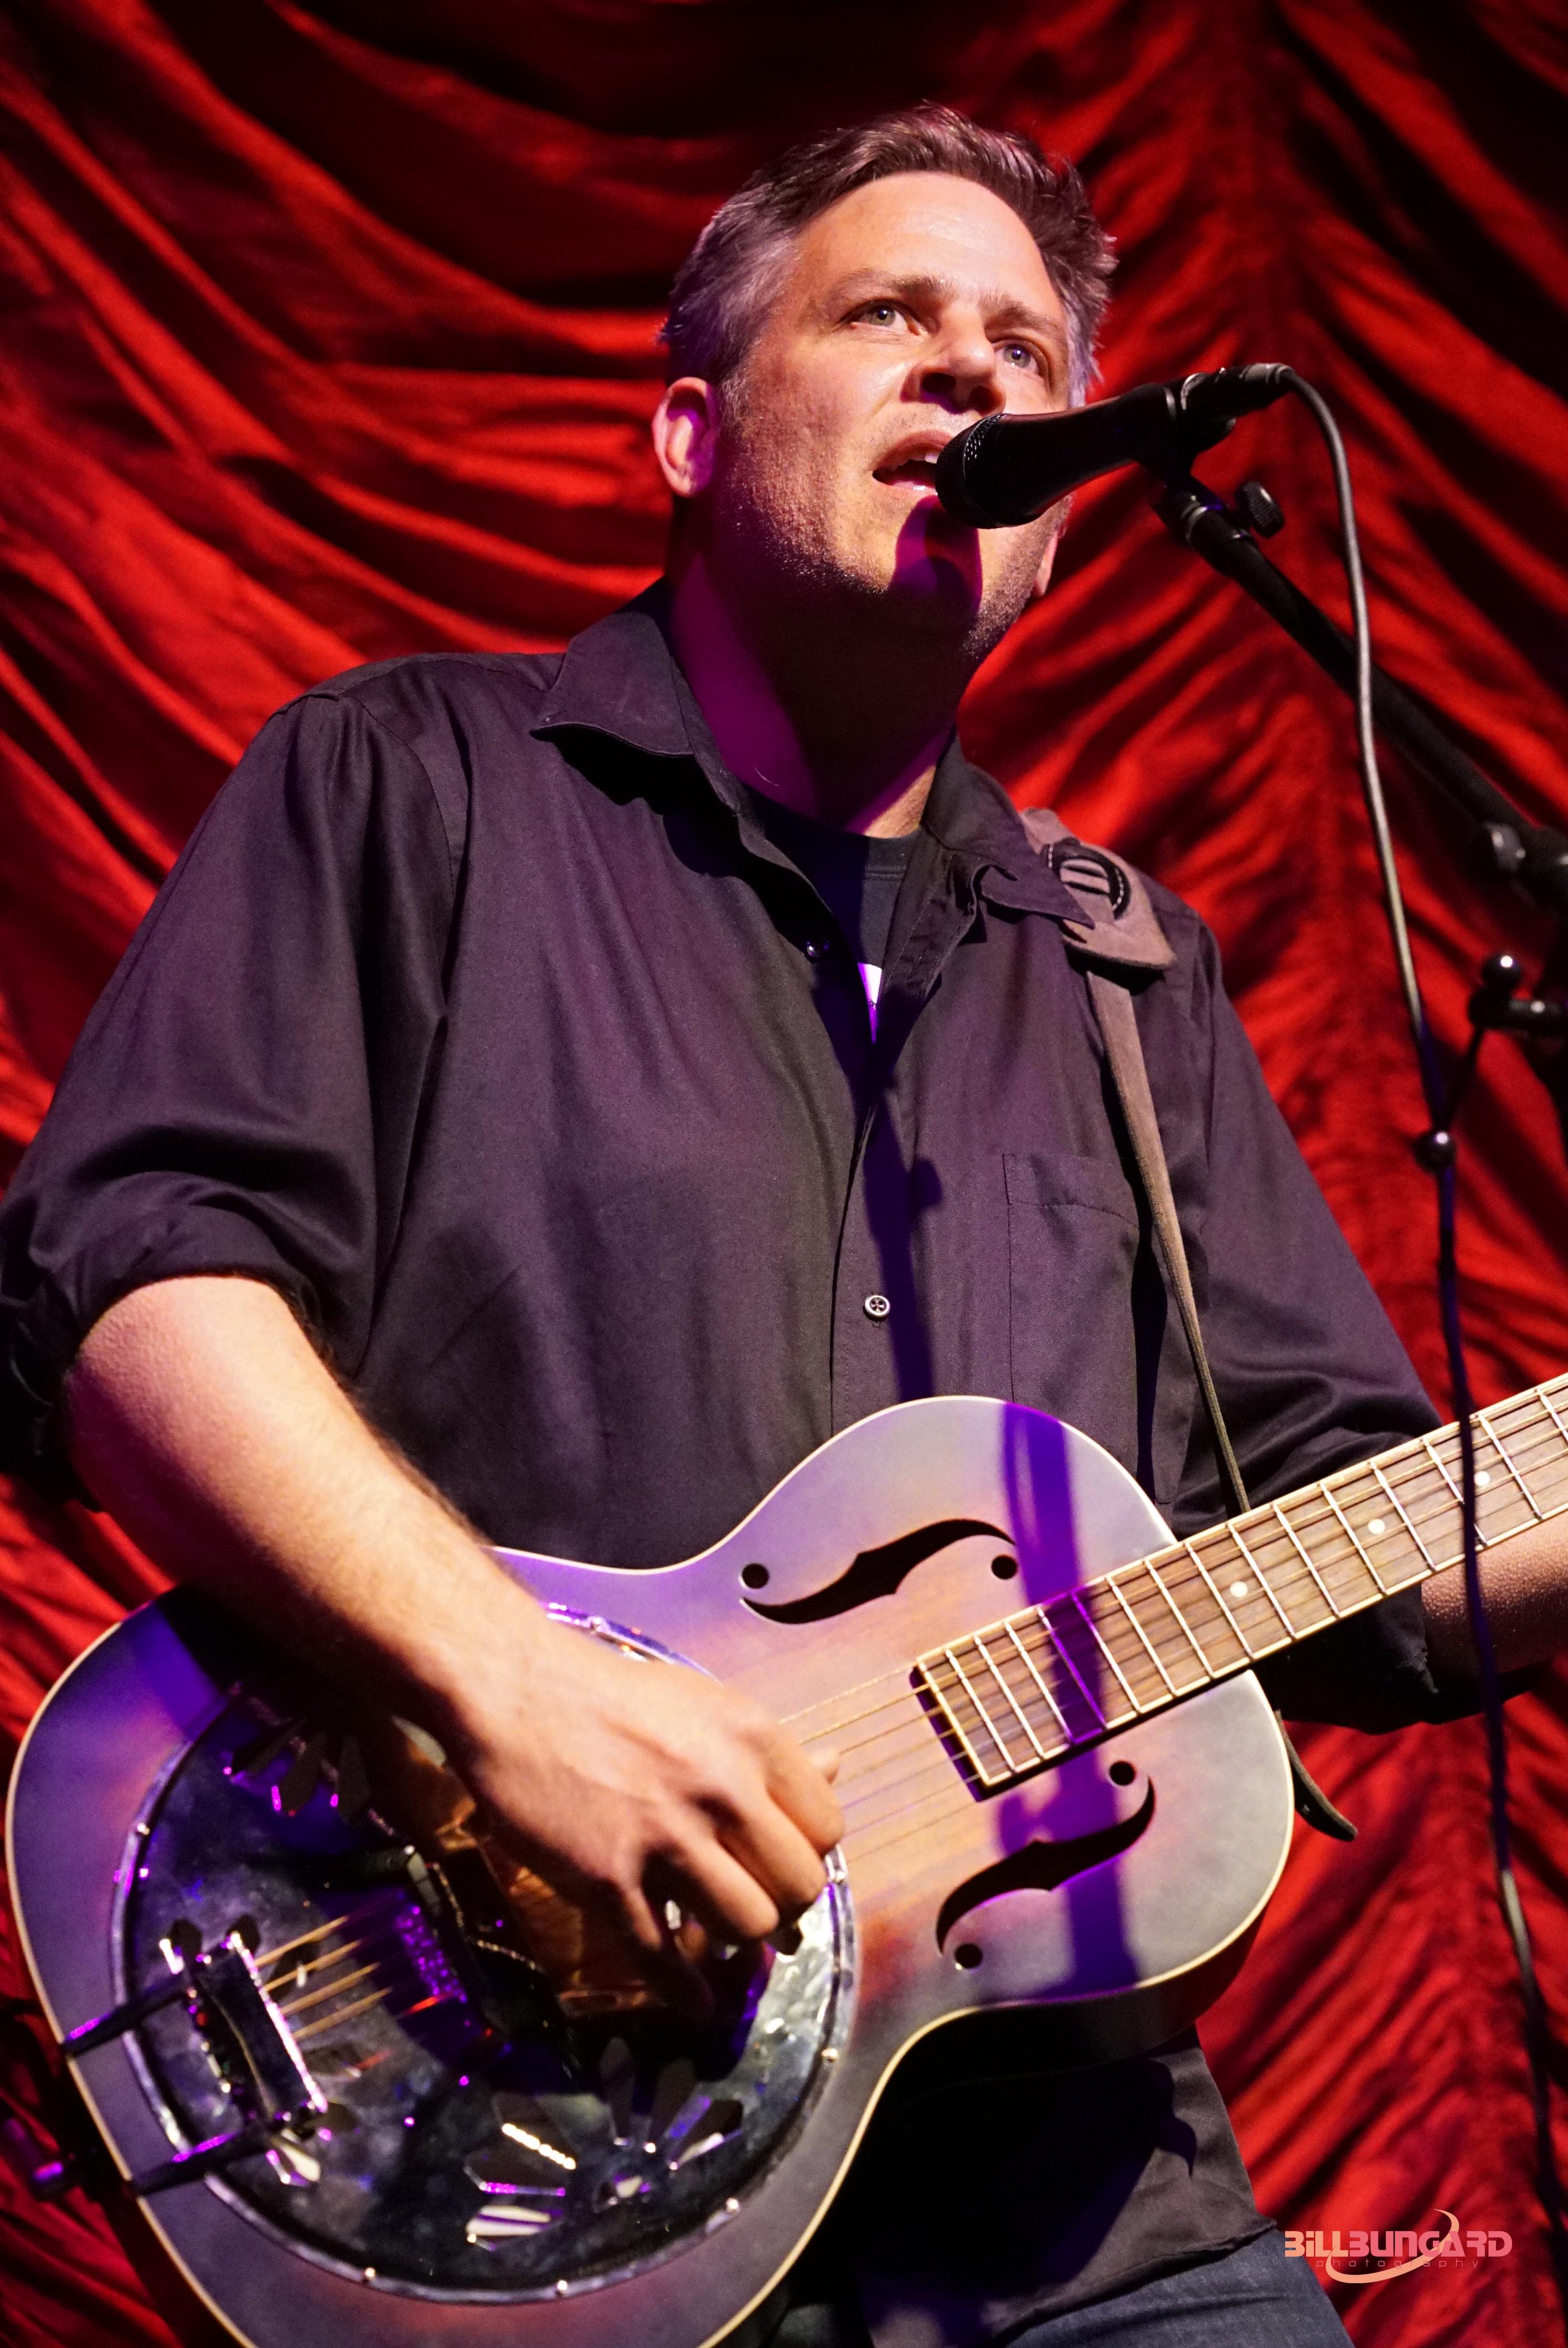 Jeremy Serwer at The Triple Door (Photo by Bill Bungard)